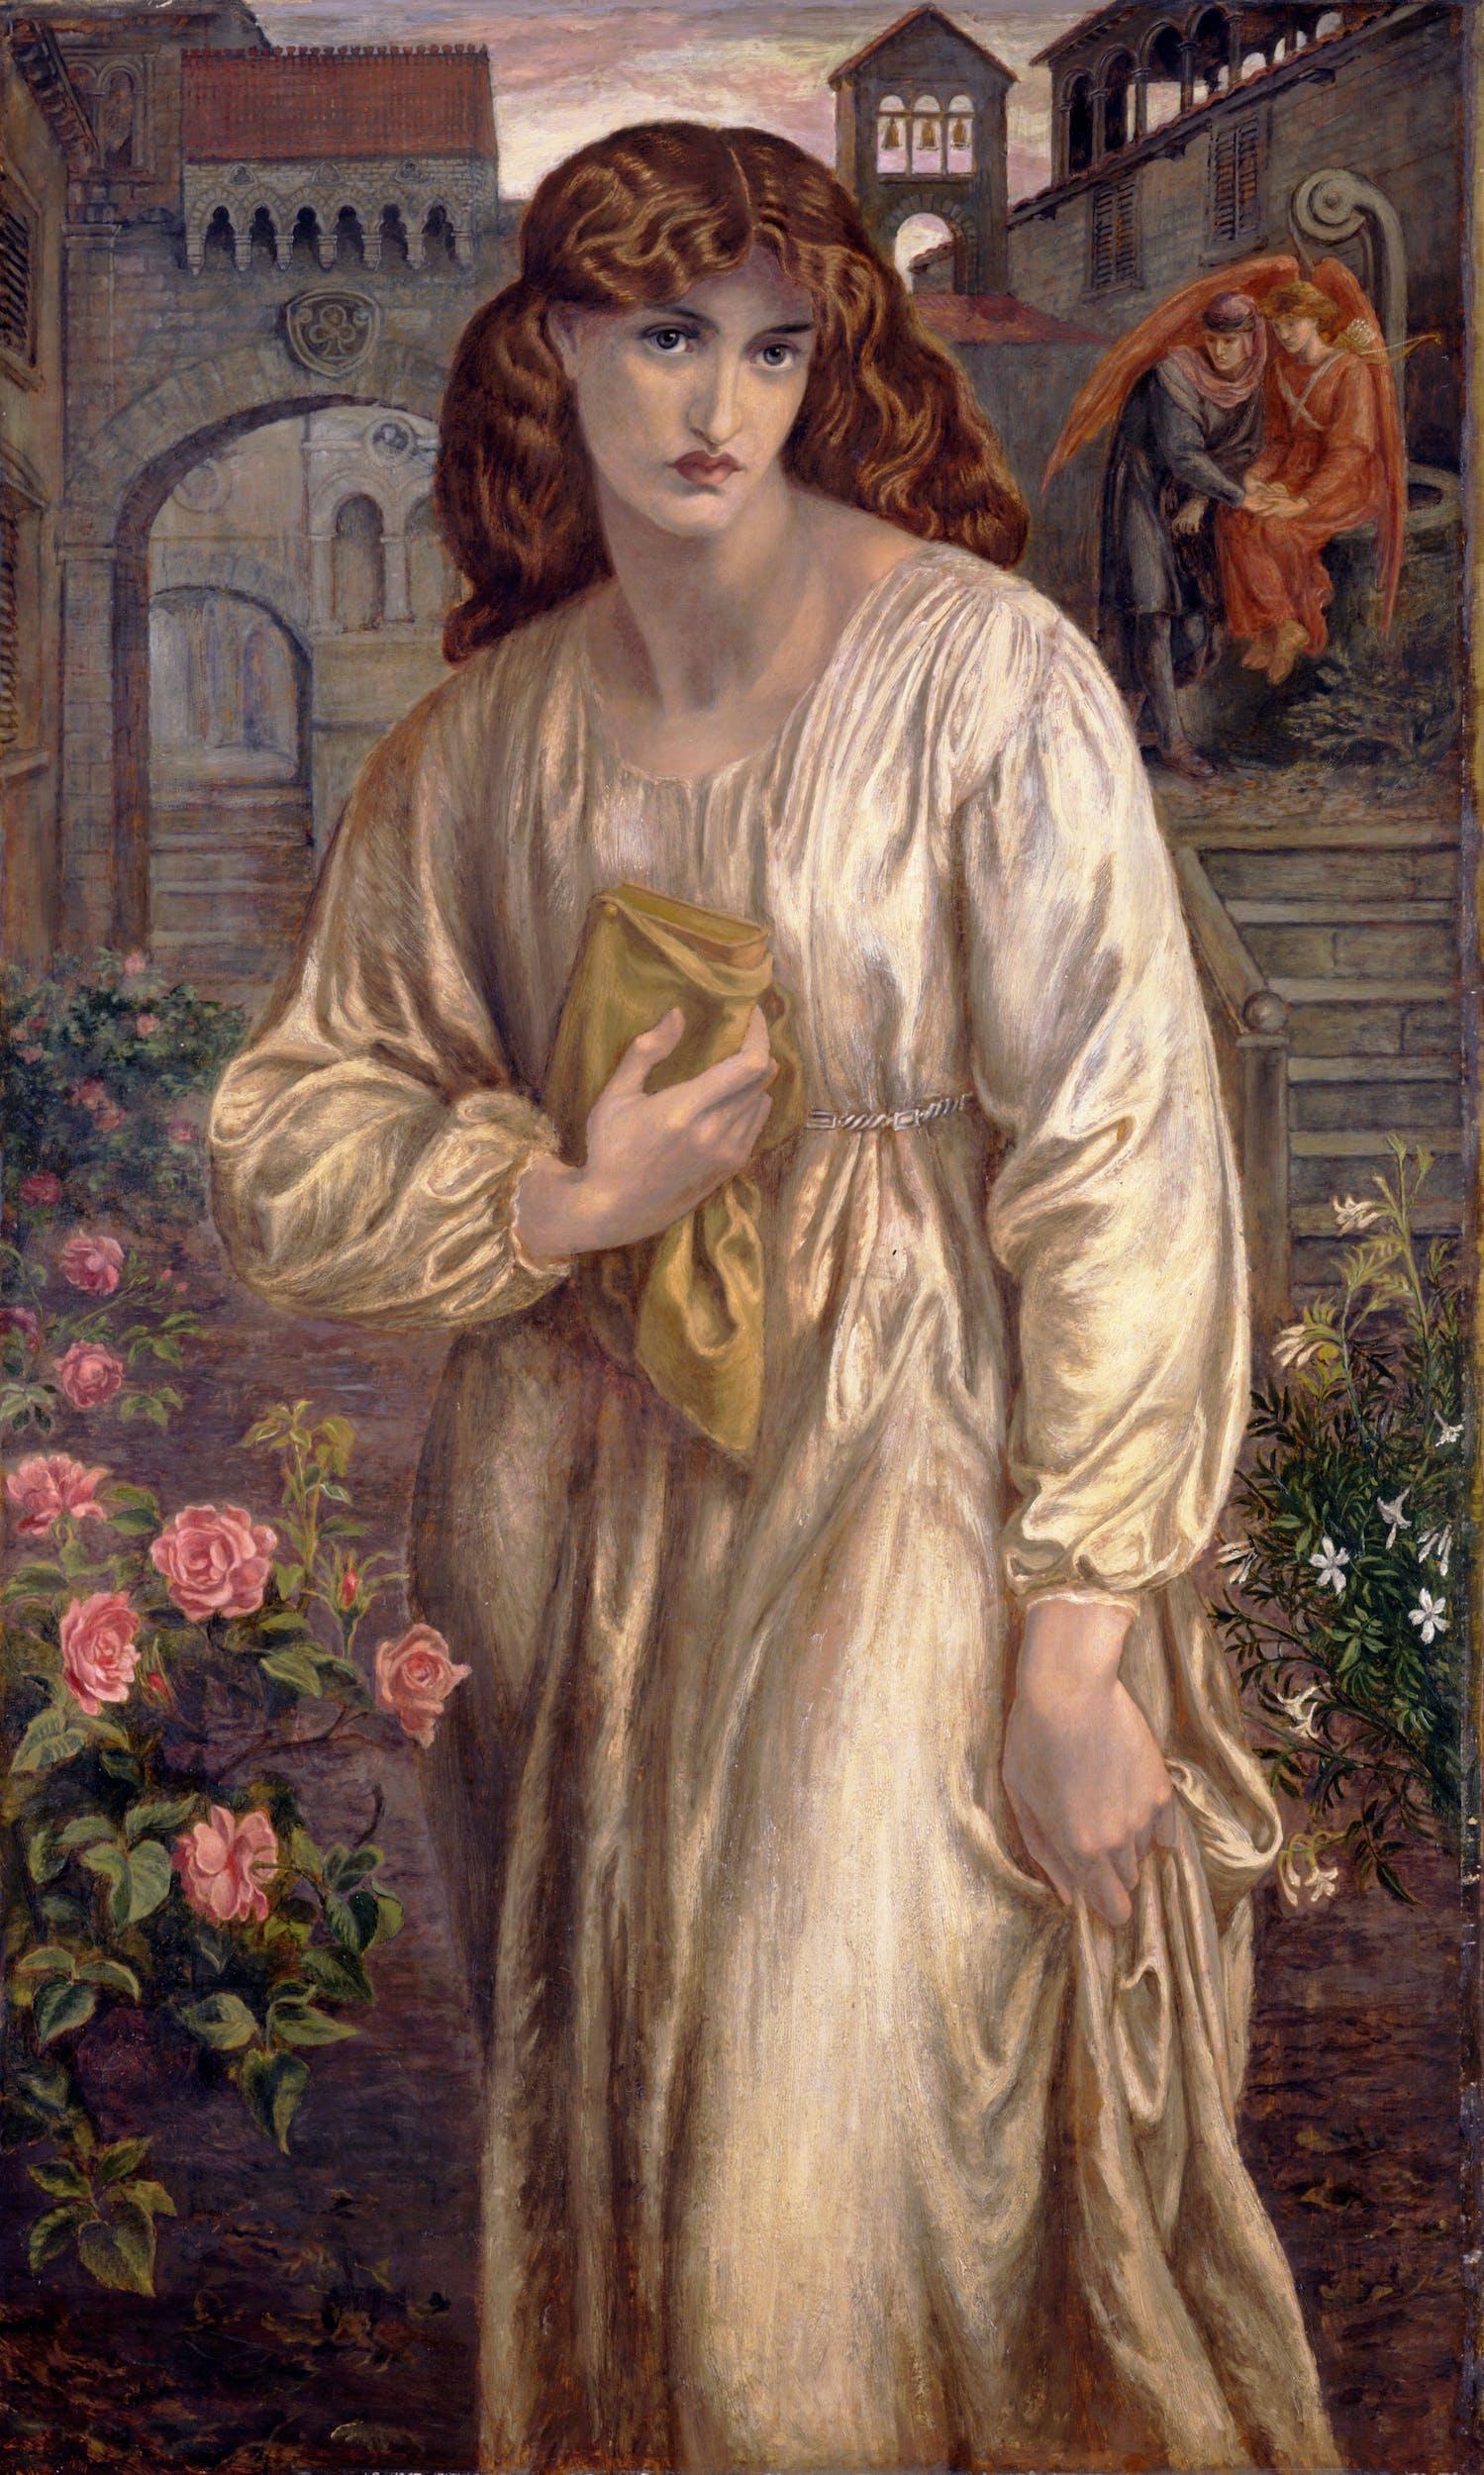 Dante Gabriel Rossetti (Londra, 1828 – Kent, 1882) Il saluto di Beatrice 1880-1882 olio su tela, 154,3 x 91,4 cm Toledo (Ohio), Museum of Art